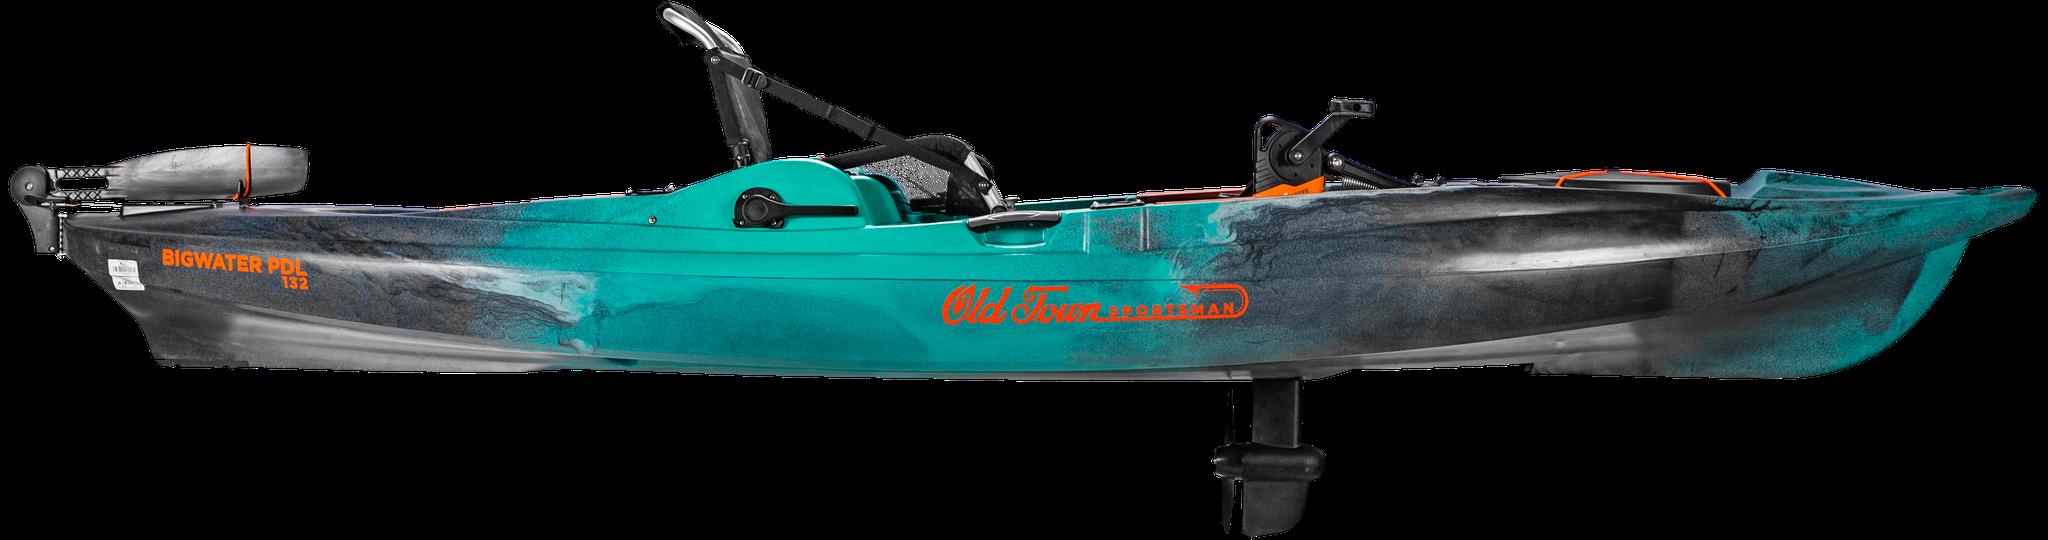 Old Town Sportsman Sportsman Big Water 132 PDL Kayak